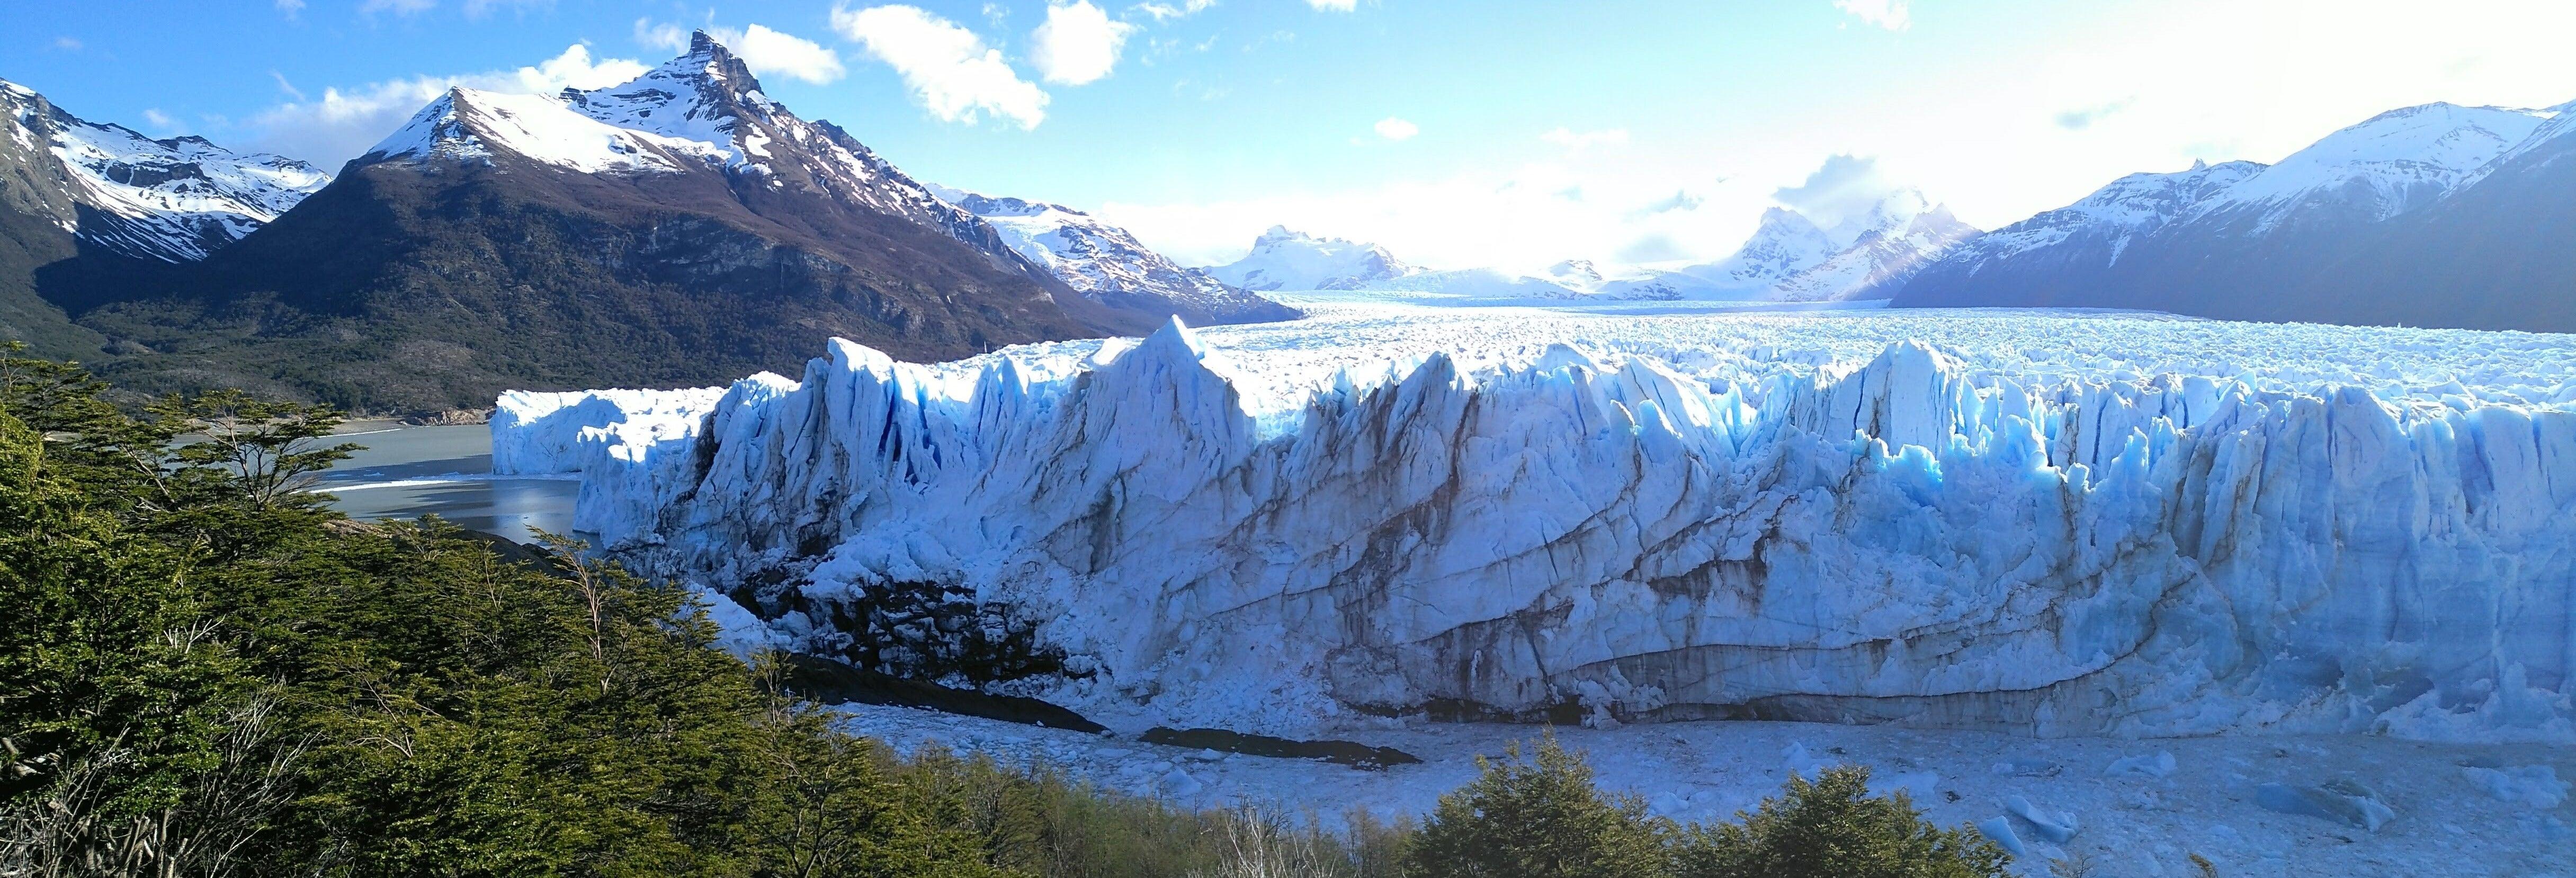 Excursion au glacier Perito Moreno